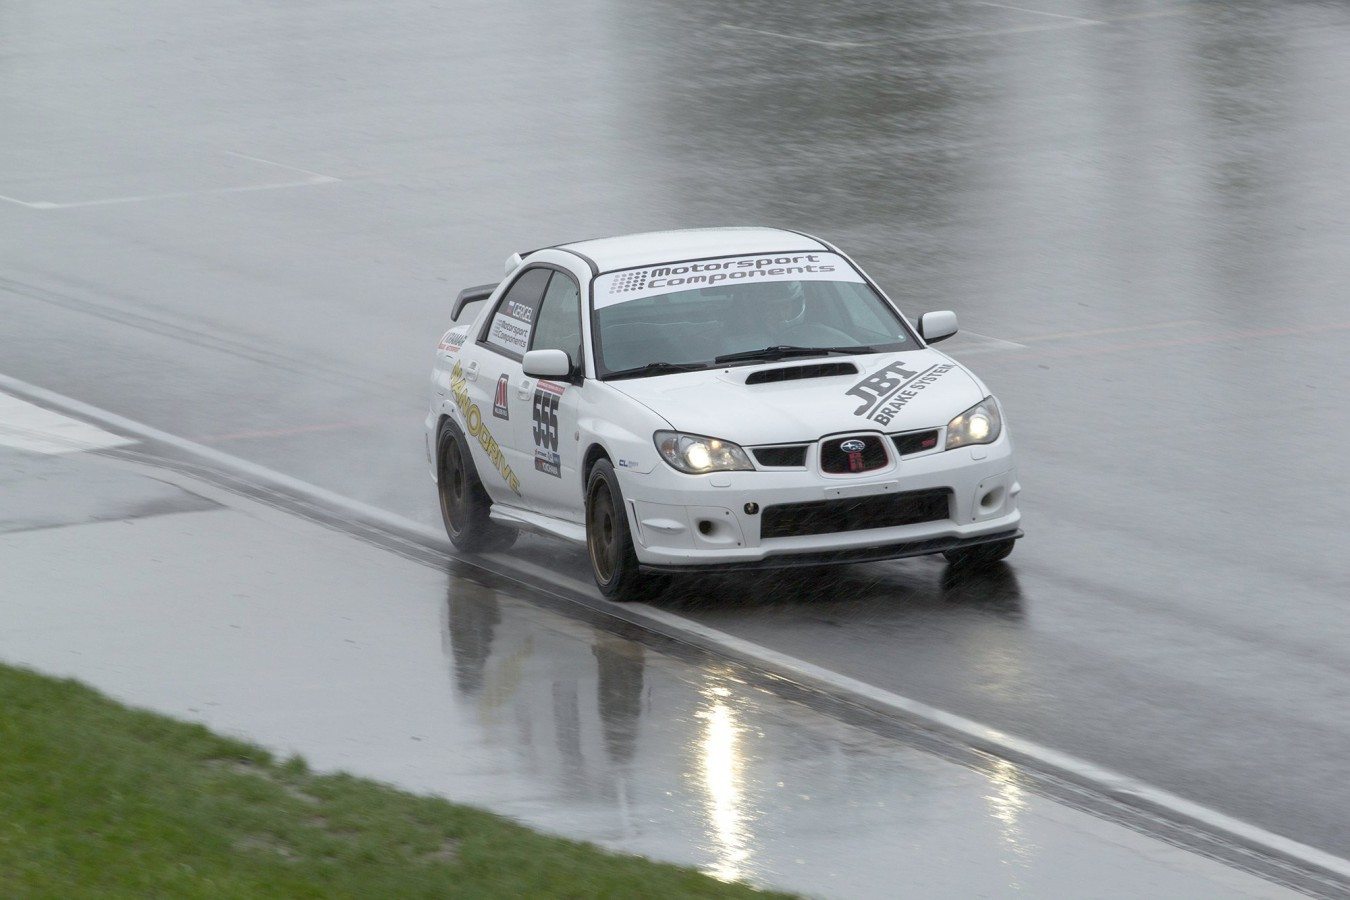 JBT Brakes Subaru Impreza Никита Гергель